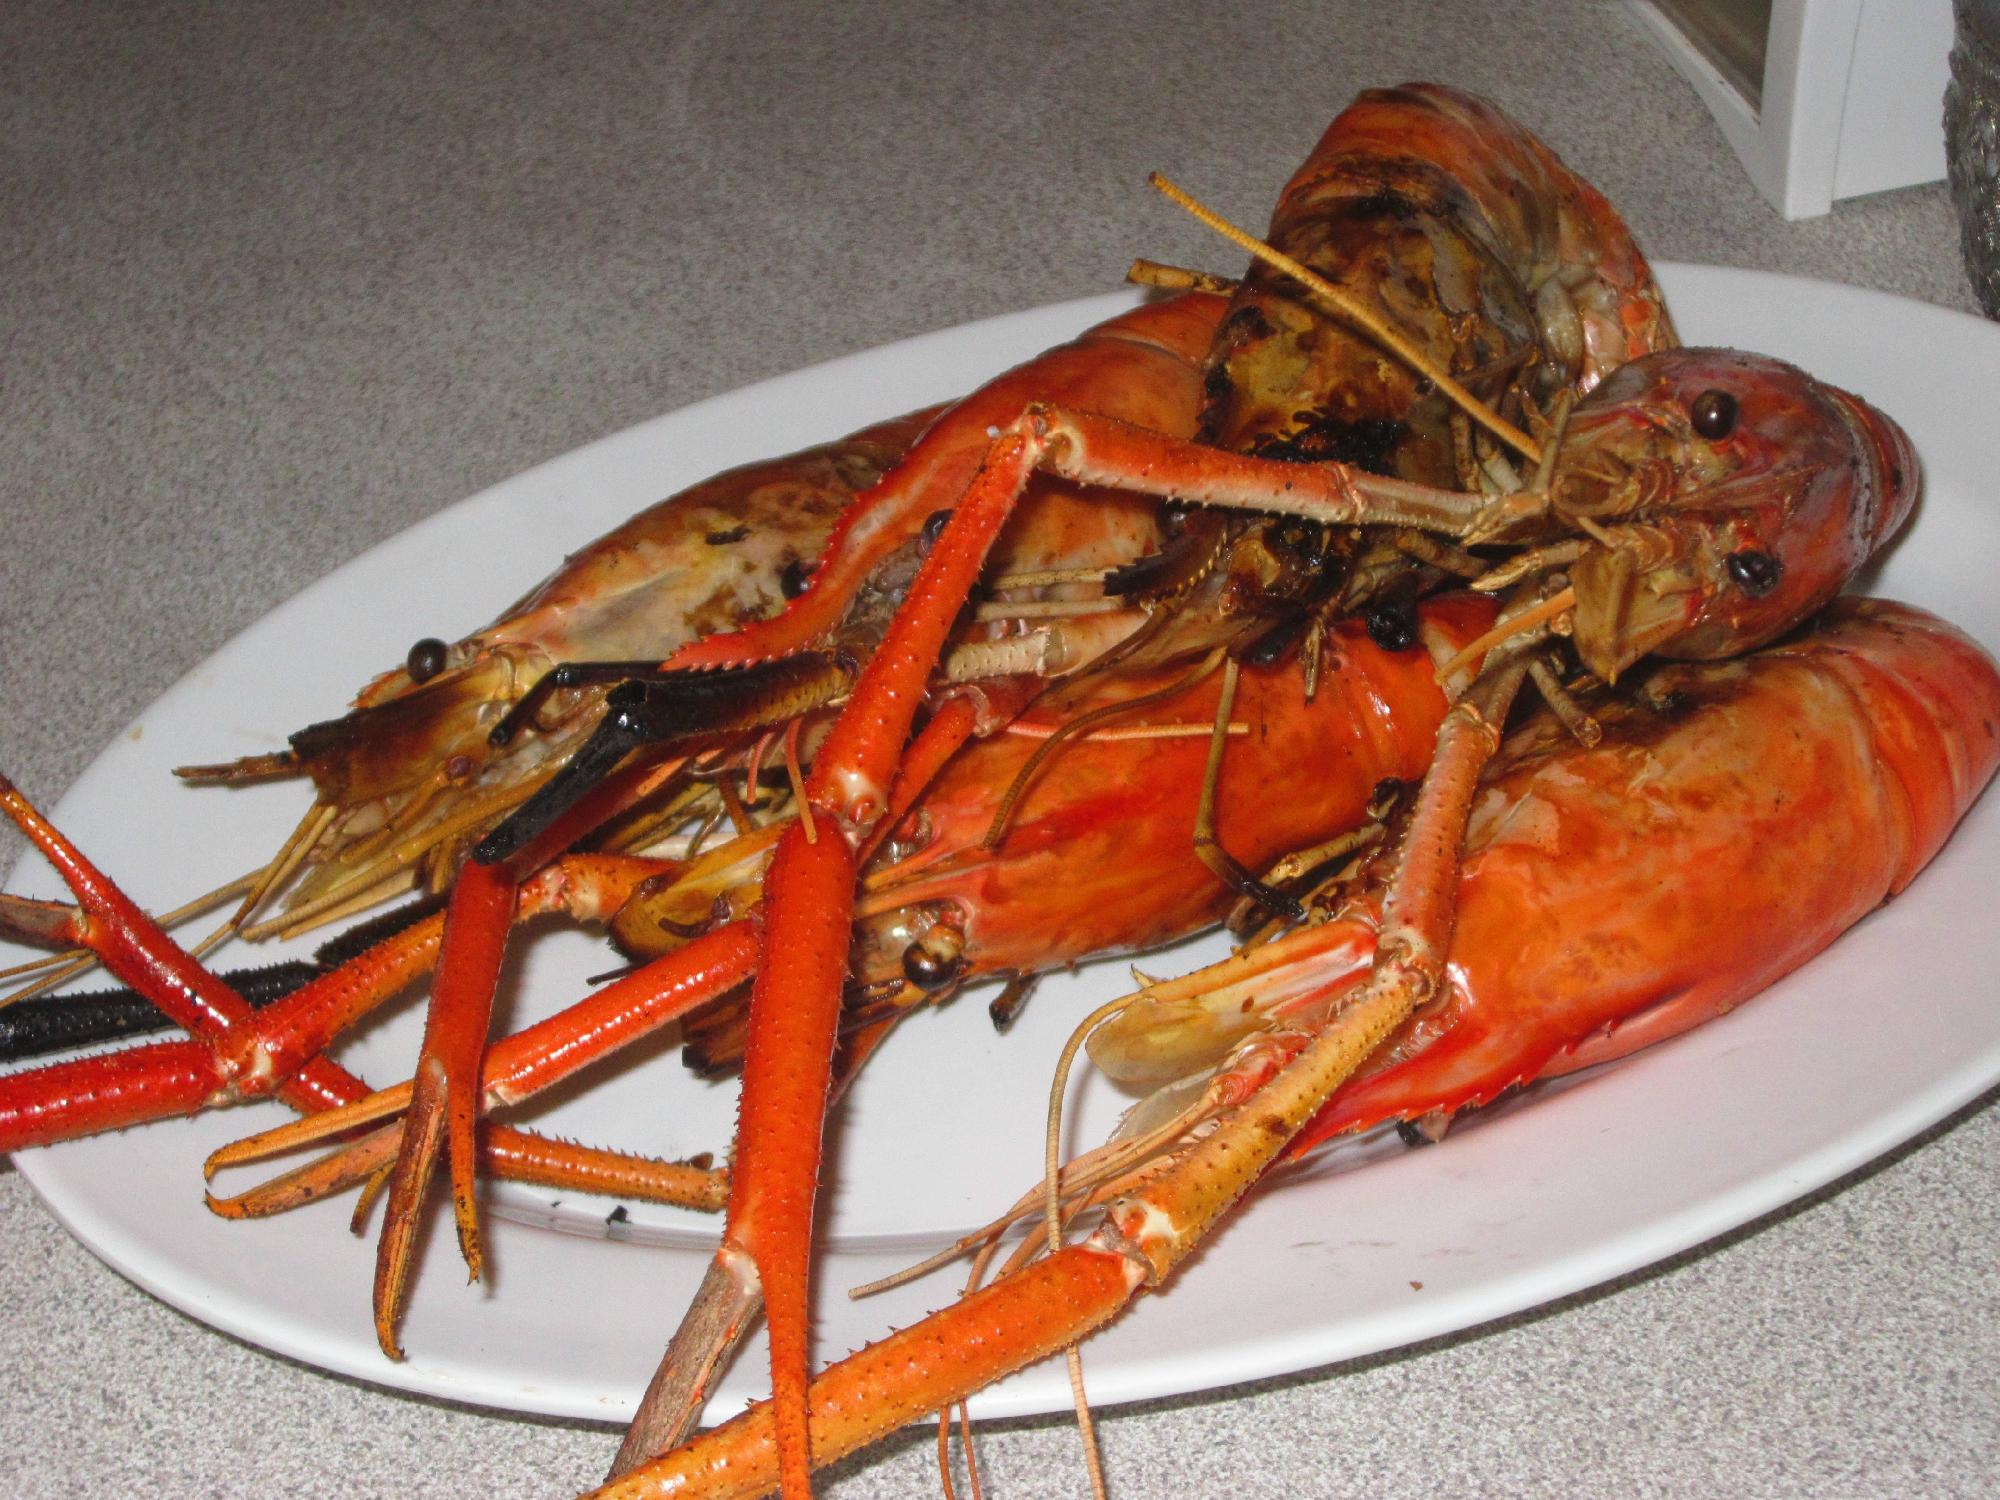 Pawat Somtum Seafood